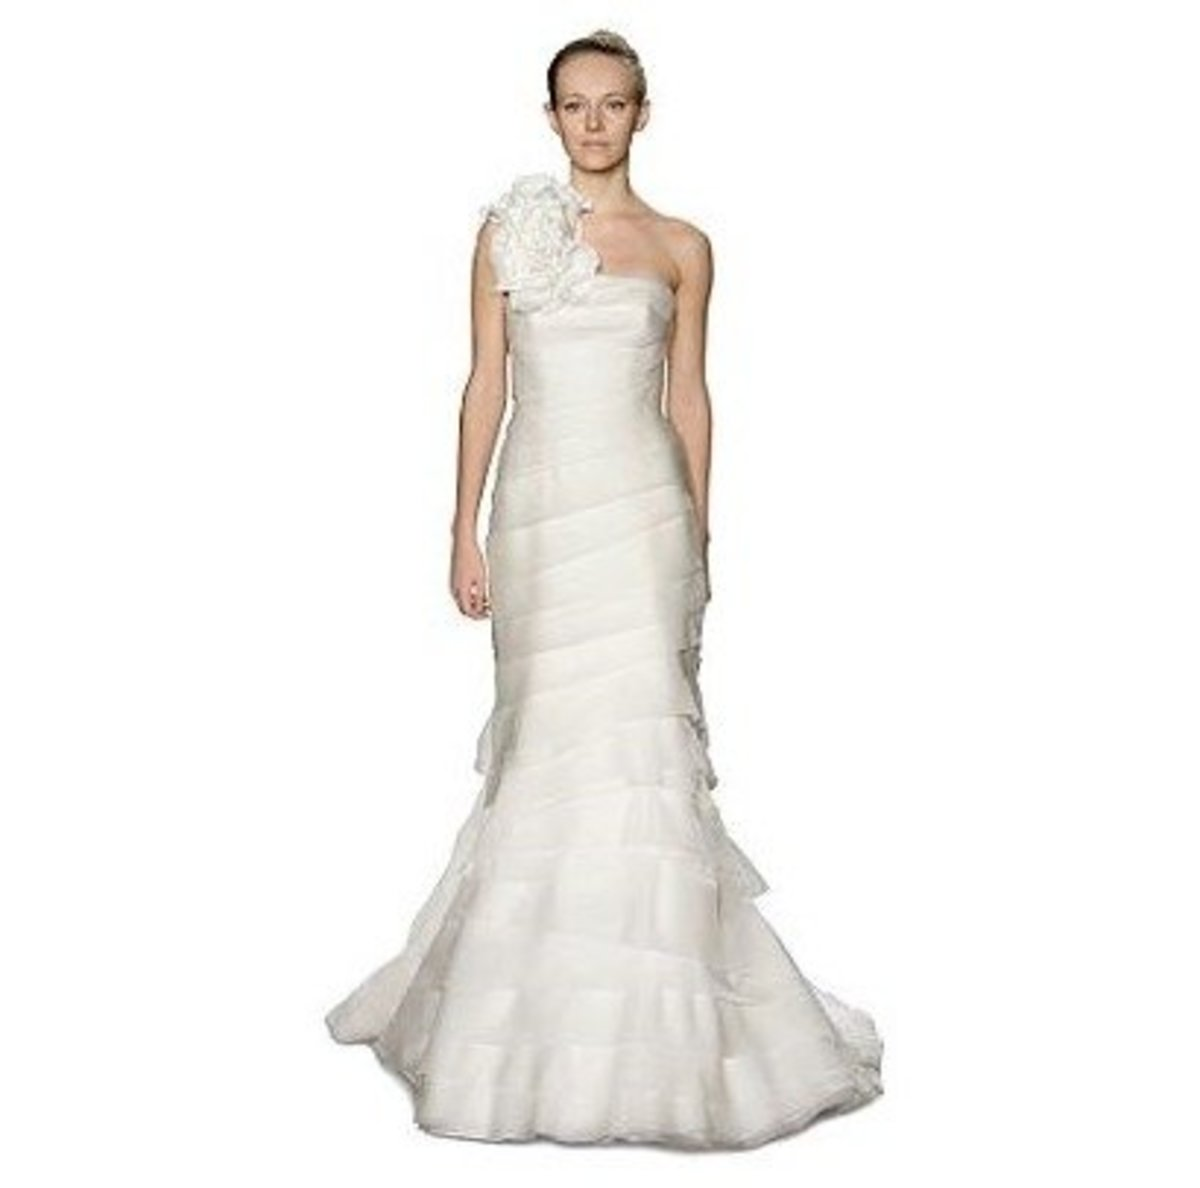 Chic Vera Wang one shoulder wedding dress